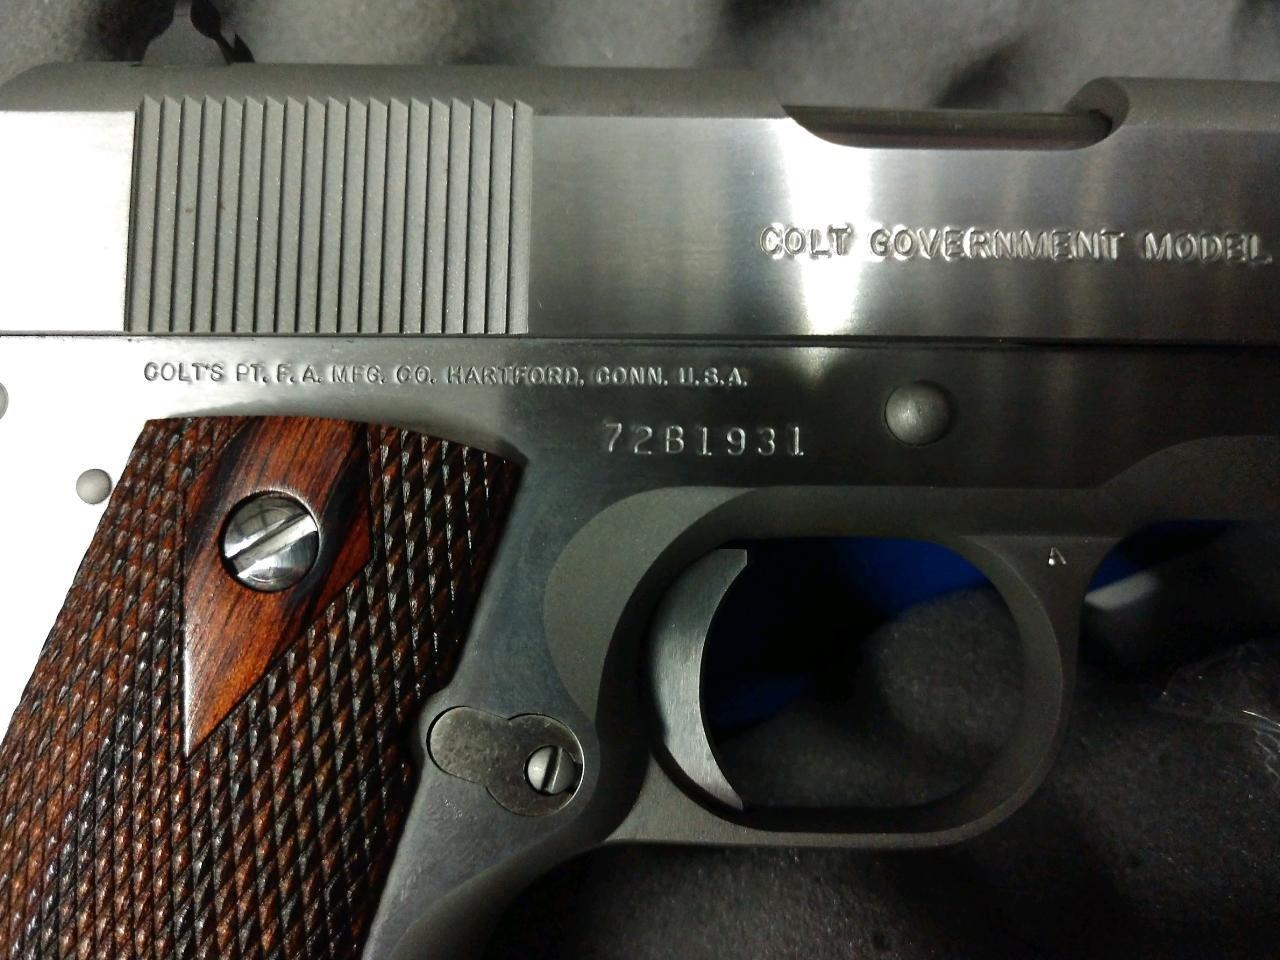 I Have A NIB Colt 1911 Series 70 ,45 ACP,5'in Barrel,brushed